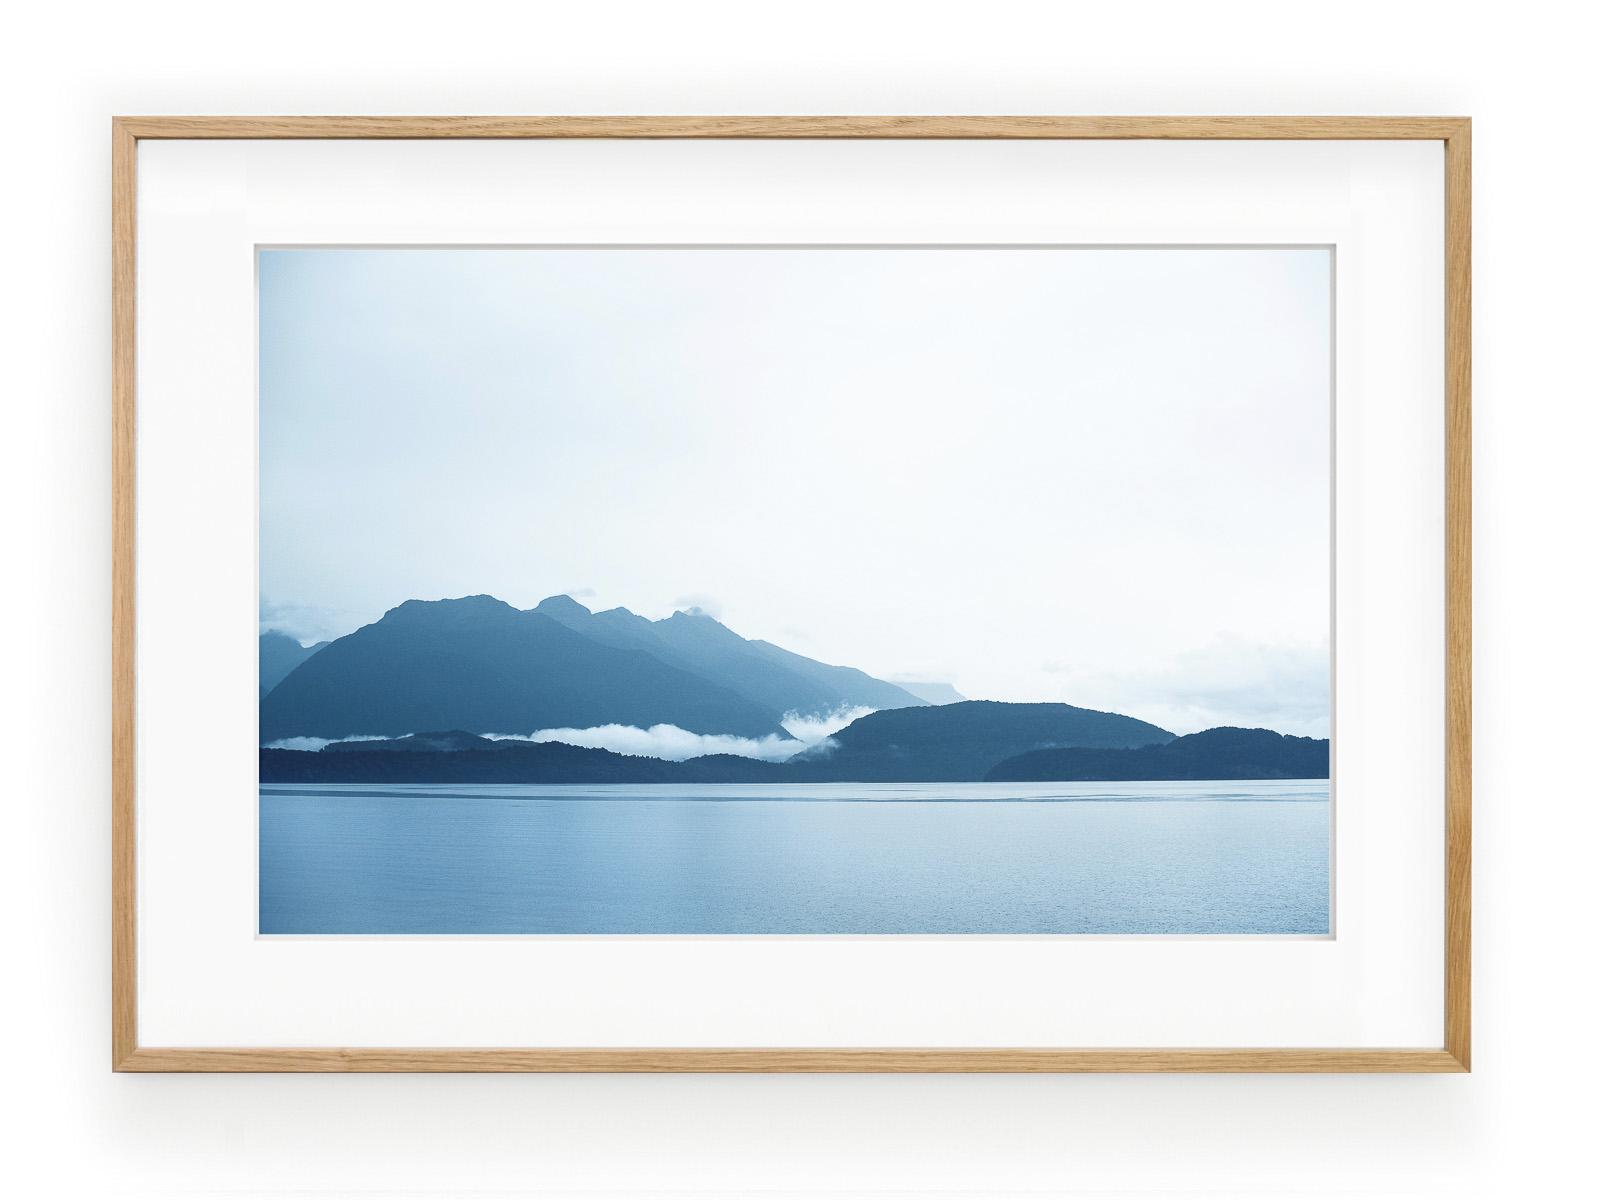 Tablou Manapouri Lake Nouvelle Zelande Oak